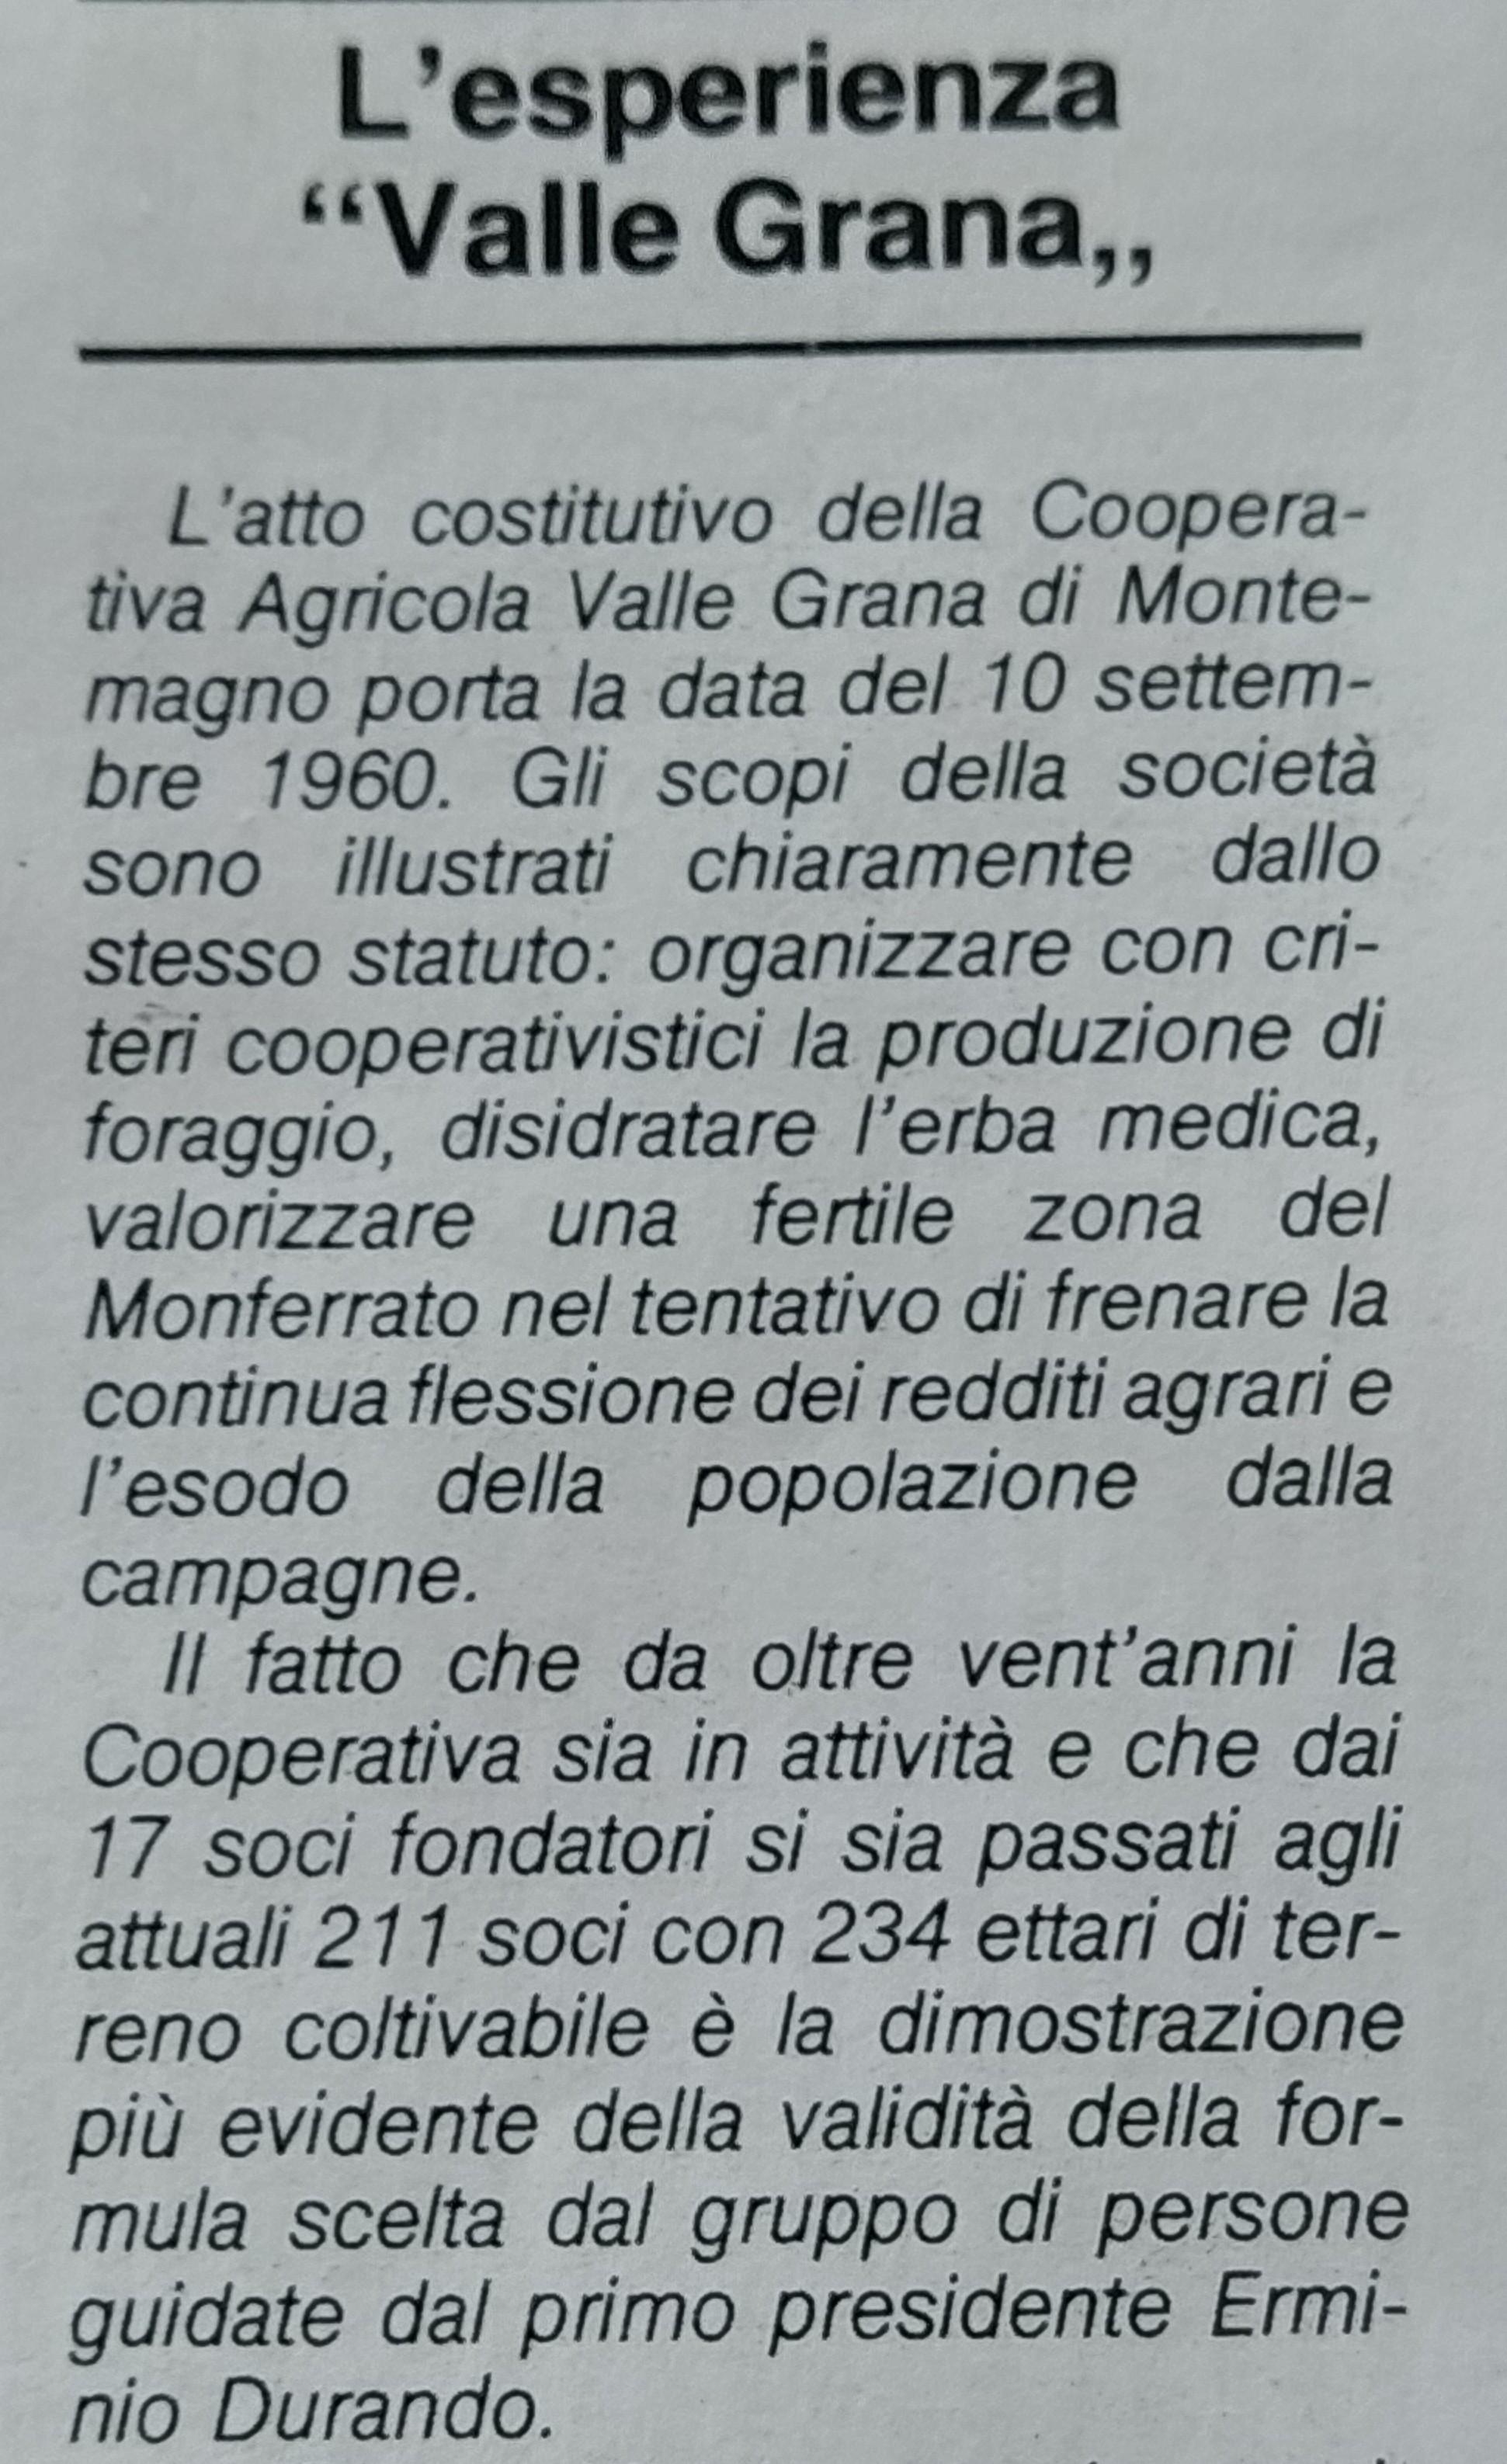 Coop VALLE GRANA CIPAM - 1 cut